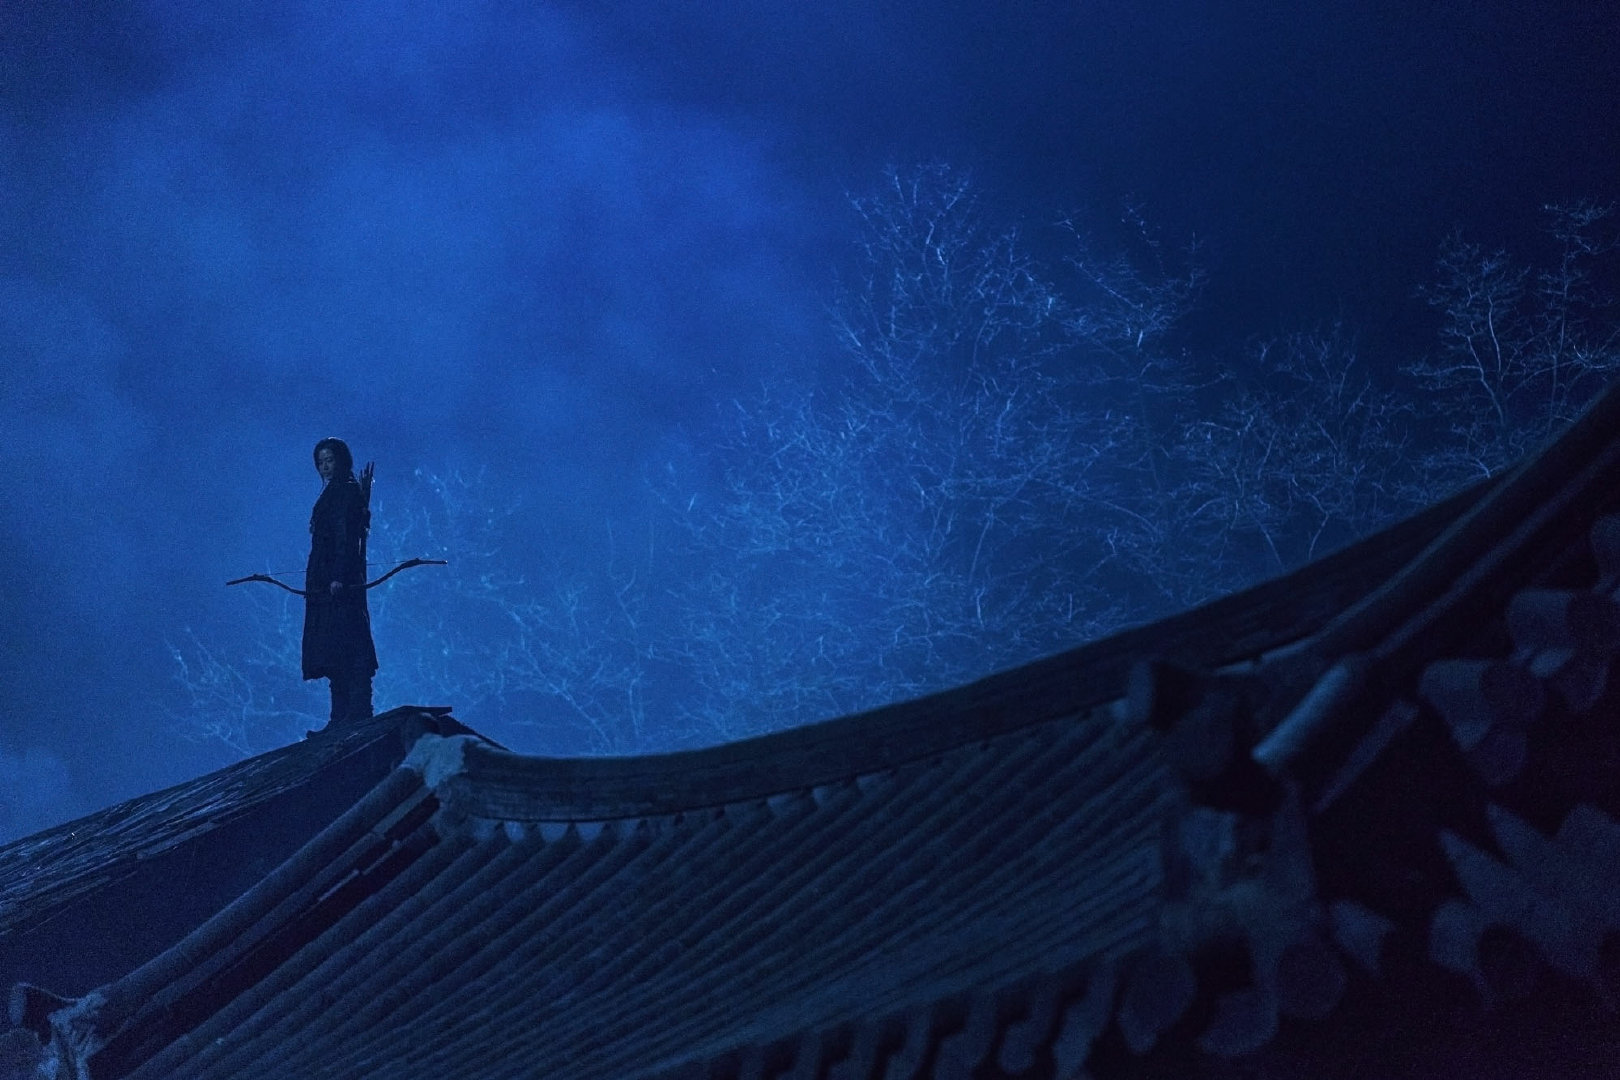 Netflix高分韩剧《王国》全两季+王国前传《北方的阿信》下载-Netflix-『游乐宫』Youlegong.com